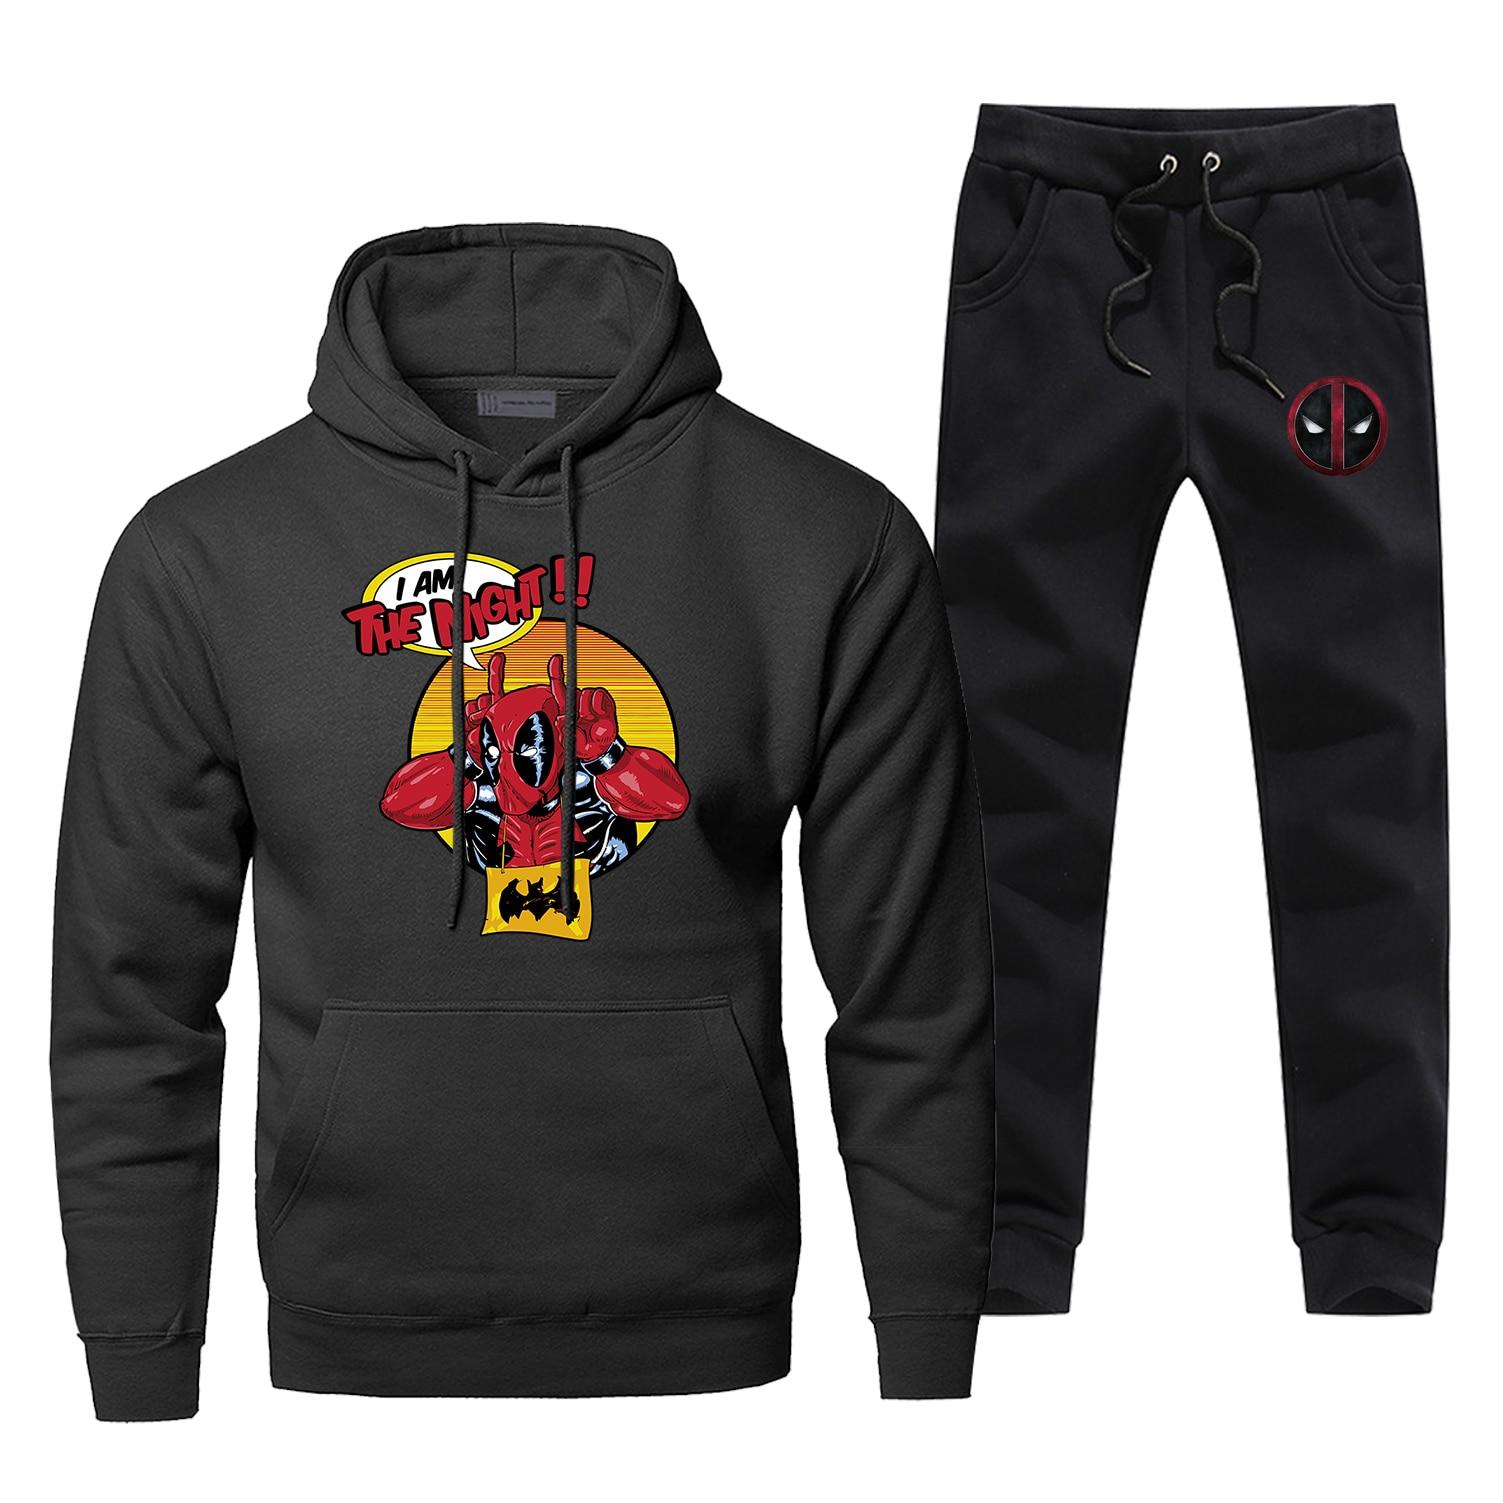 Men's Full Suit Funny Deadpool Superhero Hoodies Fashion Bodywarmer Sweatshirtpants Fleece Casual 2 Piece Set Tracksuit